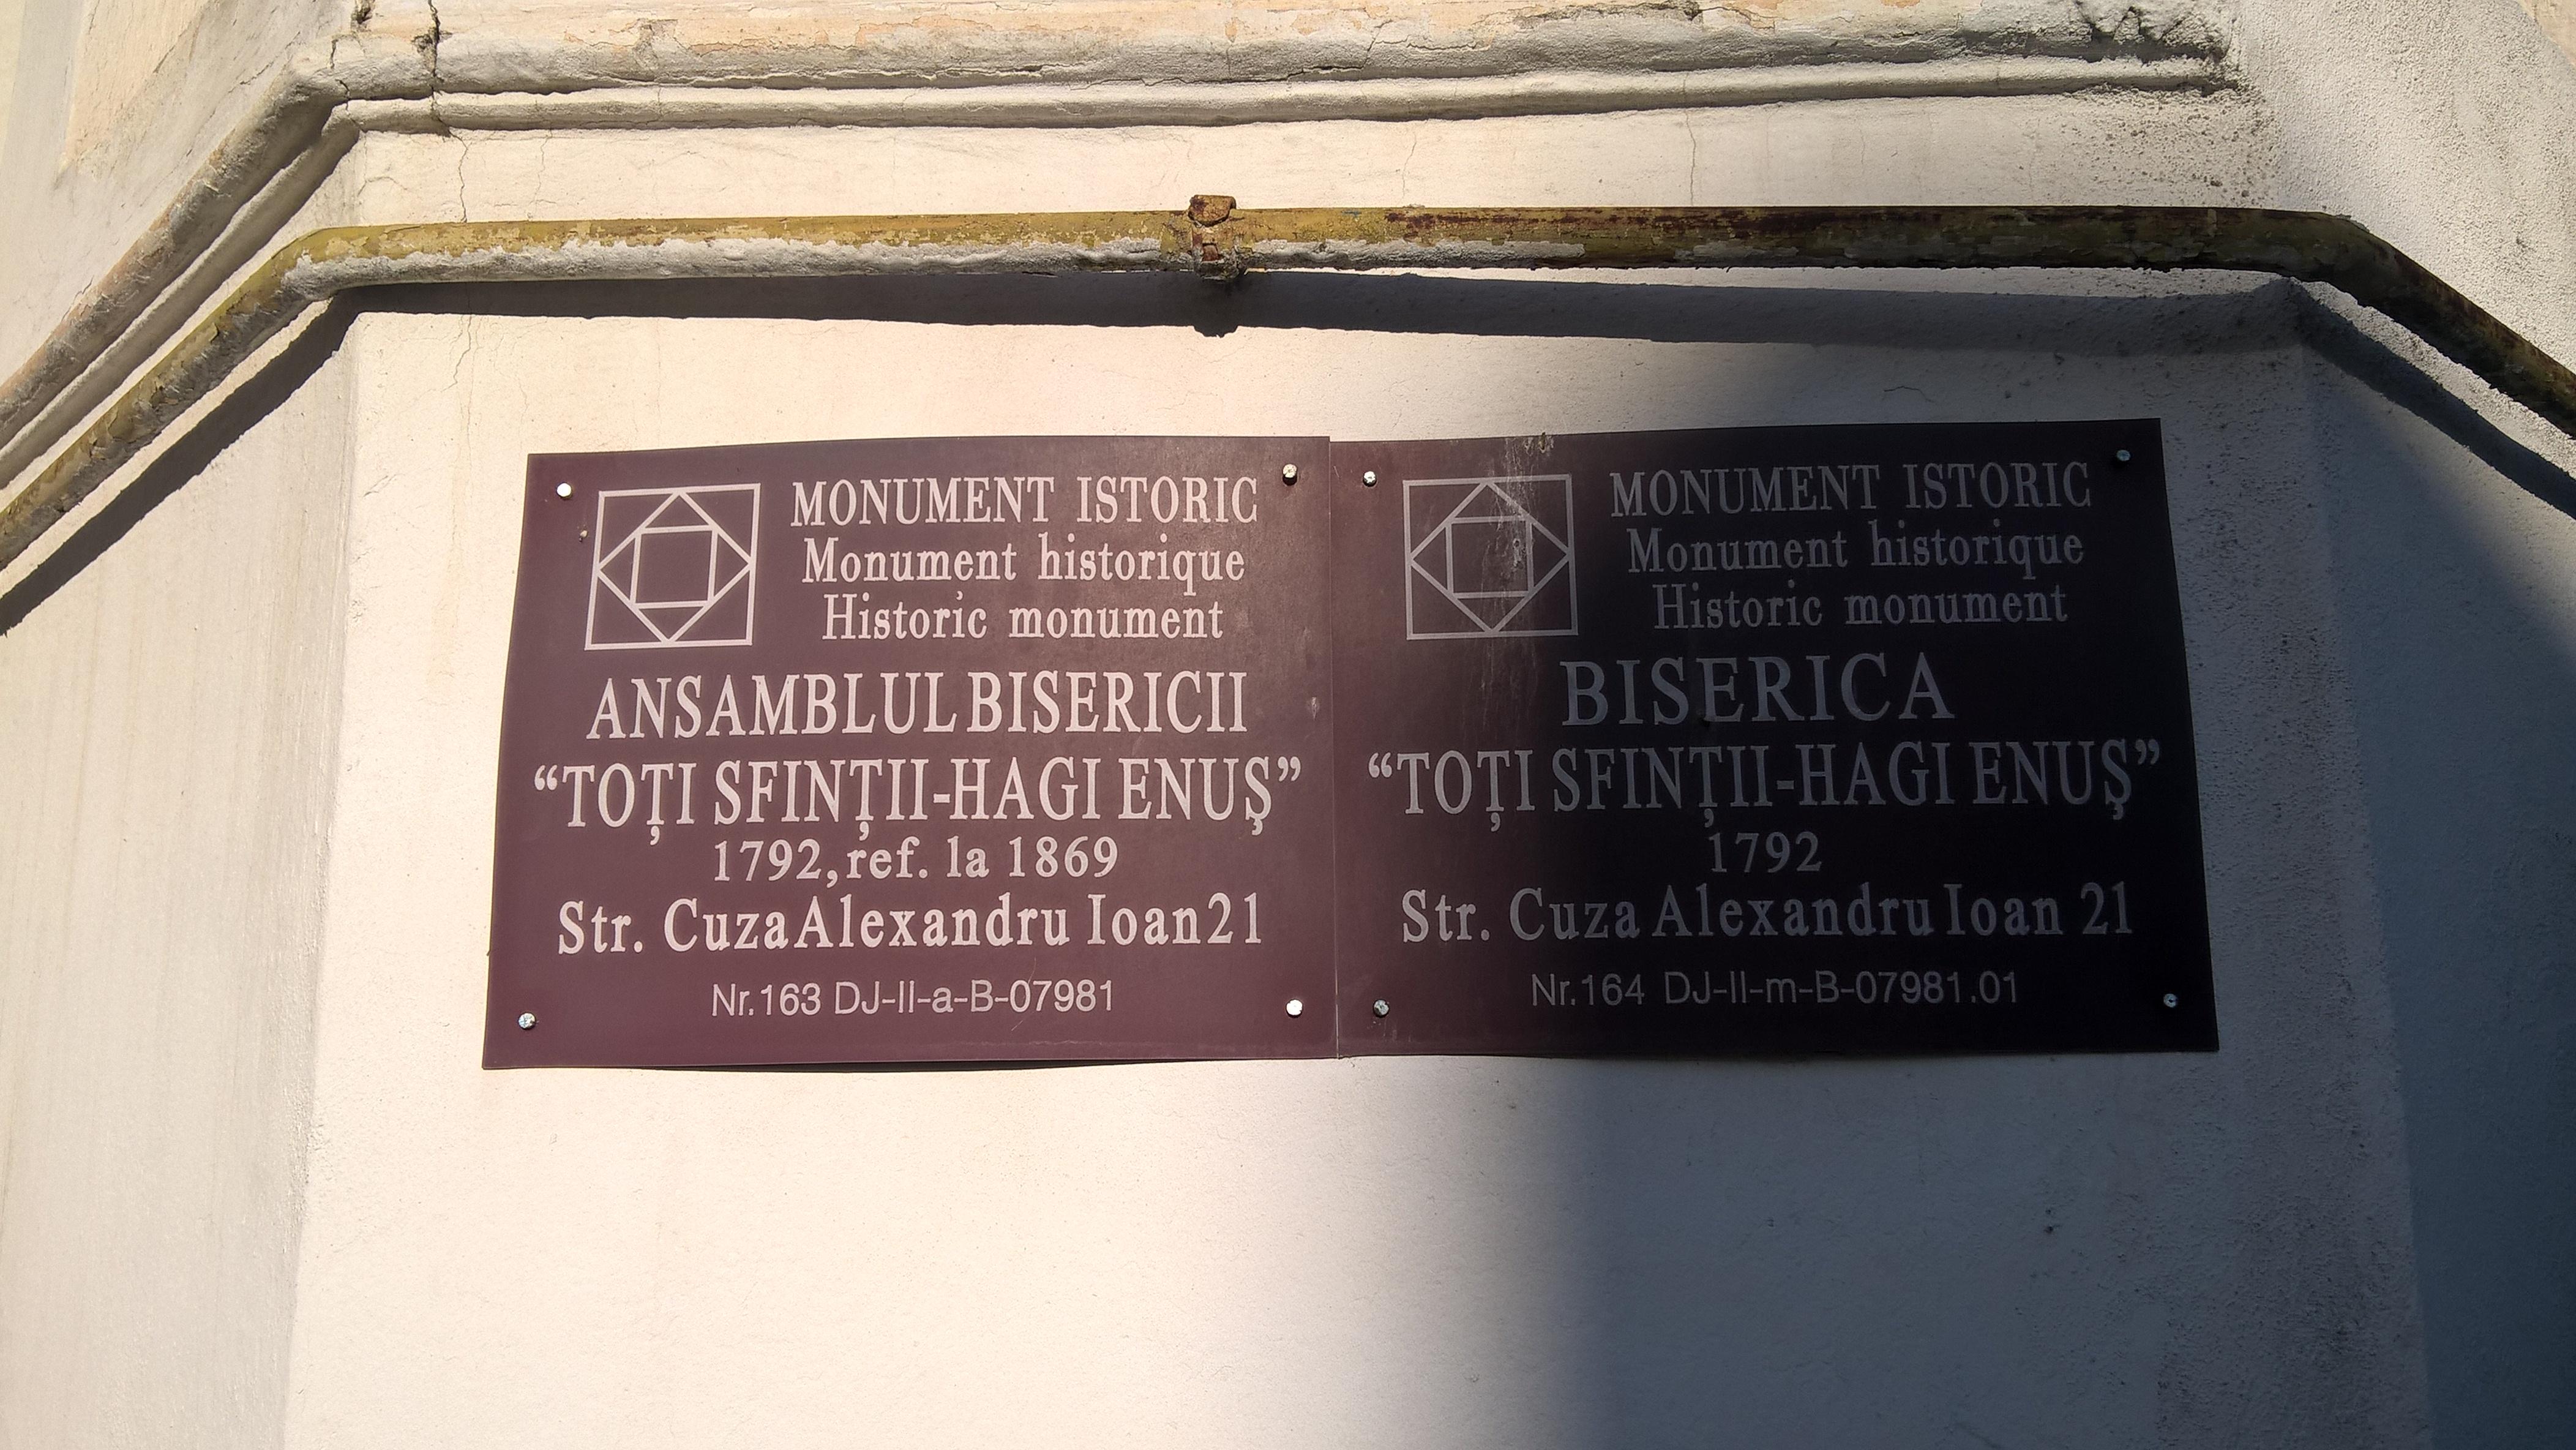 File:Ansamblul Bisericii Toti Sf-Hagi Enus DJ-II-a-B-07981 (5) jpg